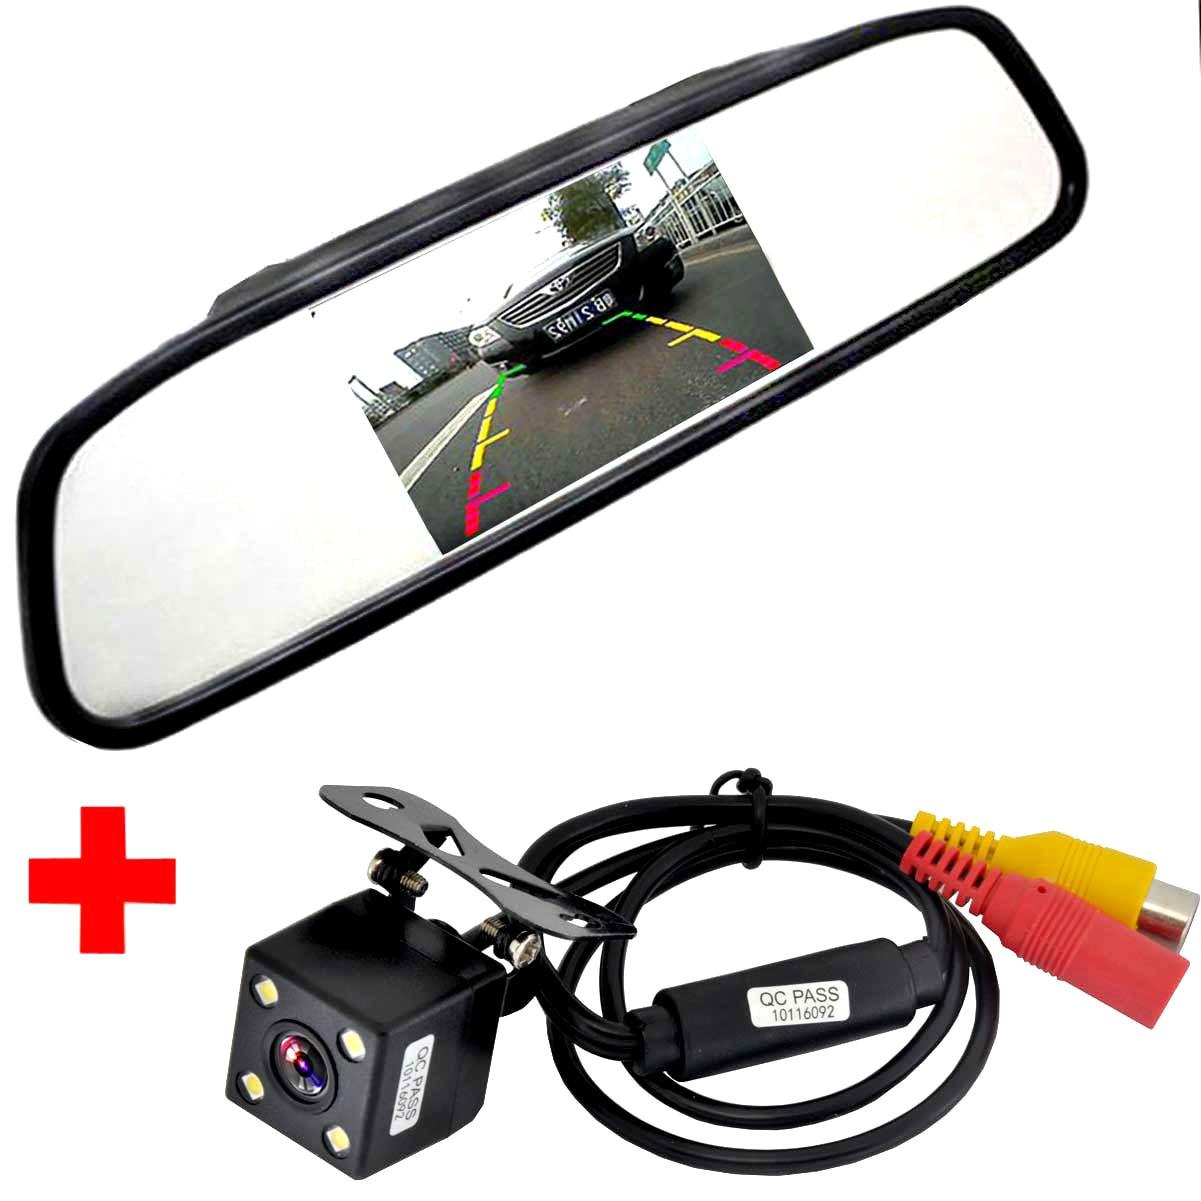 Monitor de aparcamiento automático de vídeo HD para coche, cámara de visión nocturna LED de marcha atrás CCD con Monitor retrovisor de coche de 4,3 pulgadas